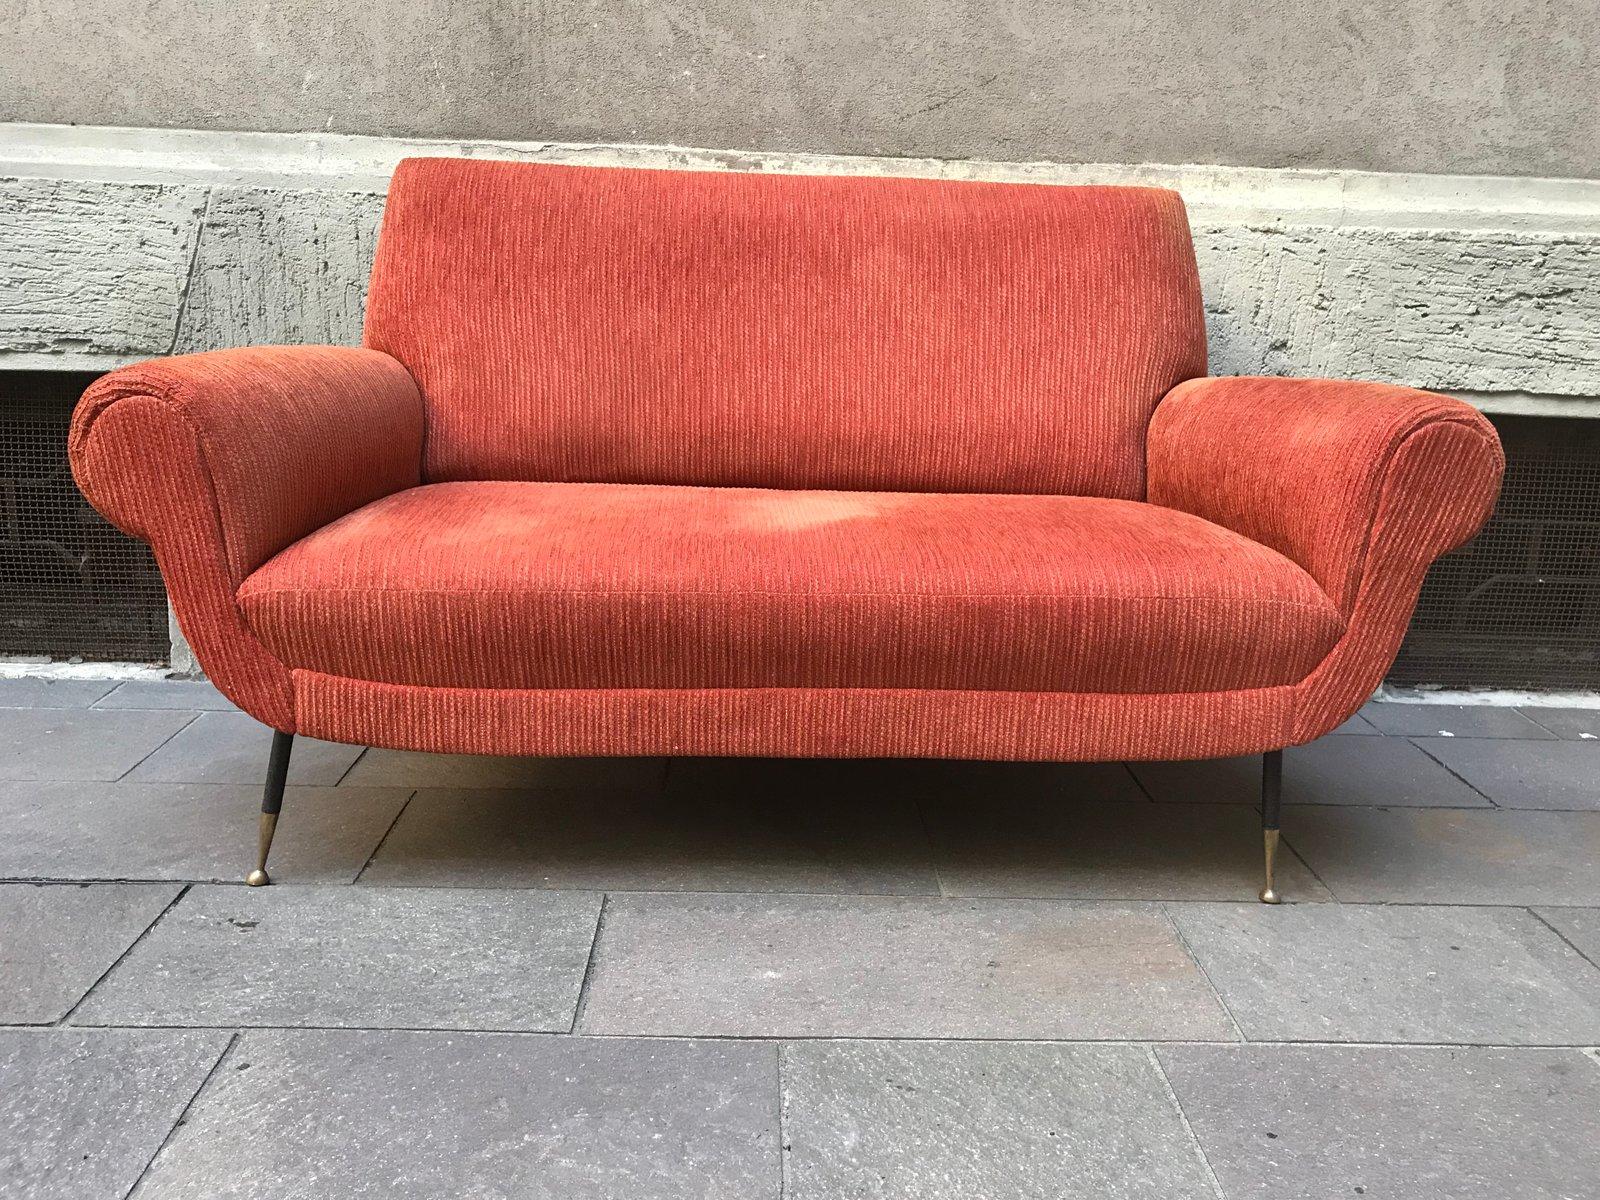 canap vintage en velours c tel orange en vente sur pamono. Black Bedroom Furniture Sets. Home Design Ideas